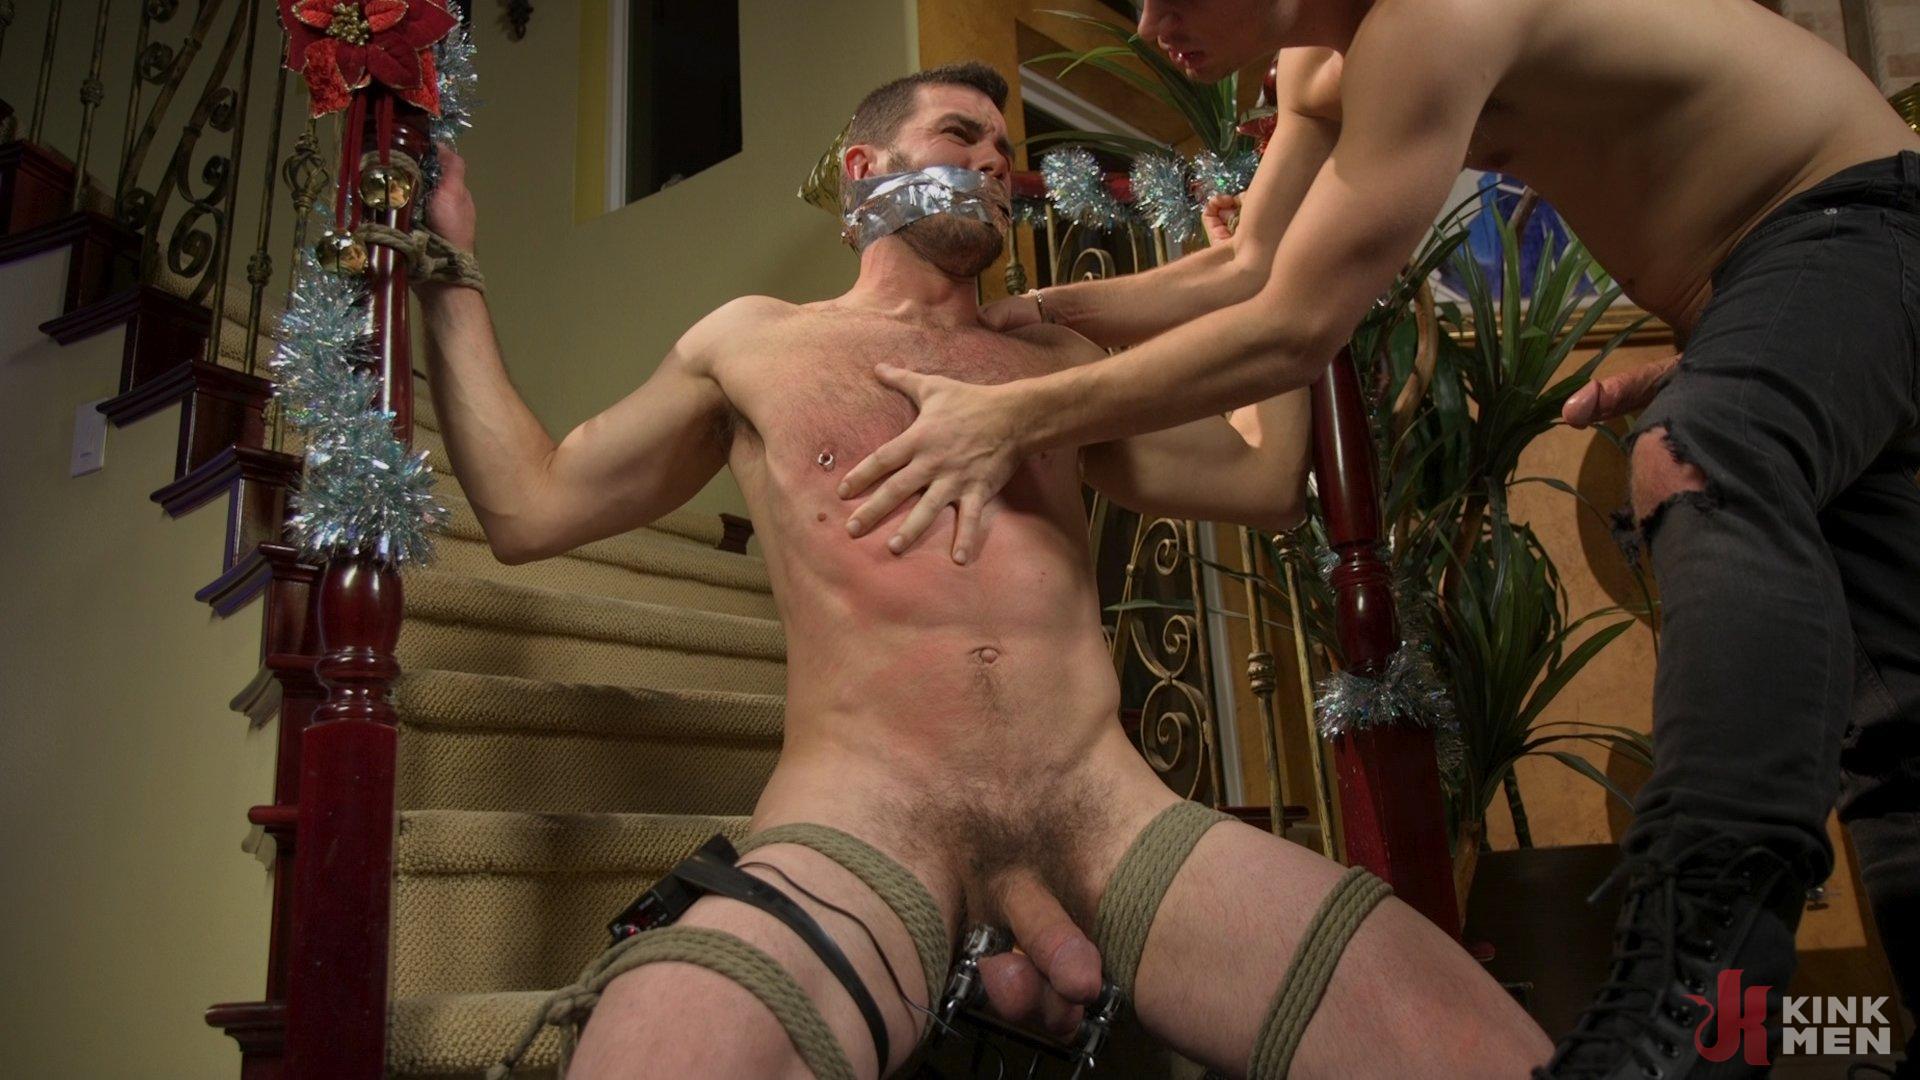 Photo number 18 from Homo Alone Part 2: Pizza Man Michael DelRay Punishes Vander Pulaski shot for Bound Gods on Kink.com. Featuring Michael DelRay and Vander Pulaski in hardcore BDSM & Fetish porn.